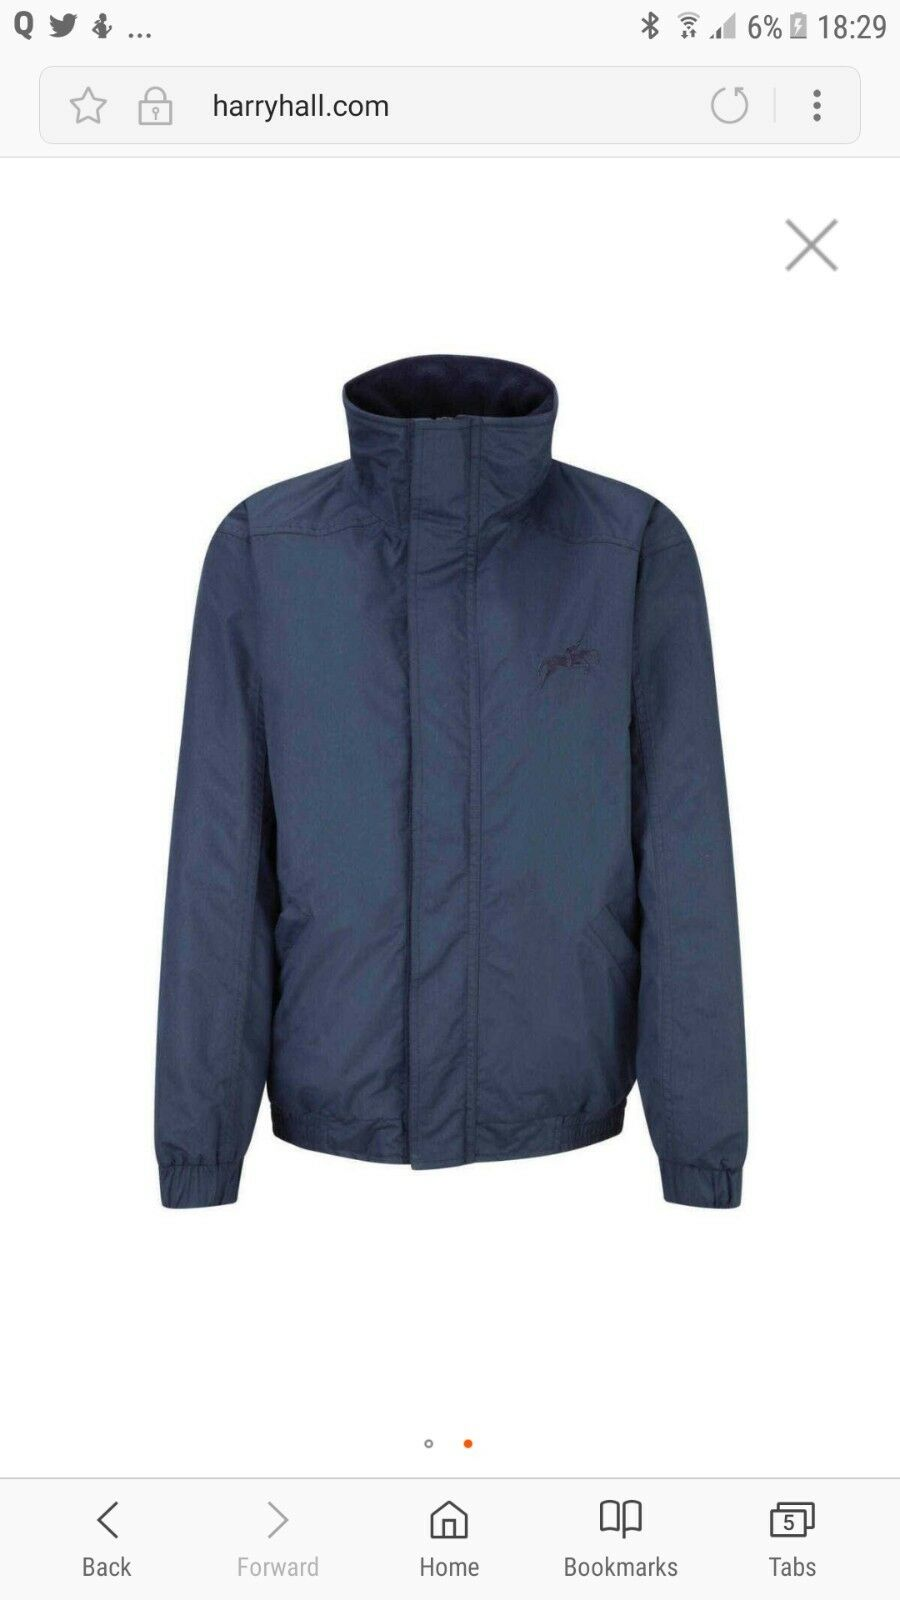 Harry hall kids blouson coat 11-12 BNWT